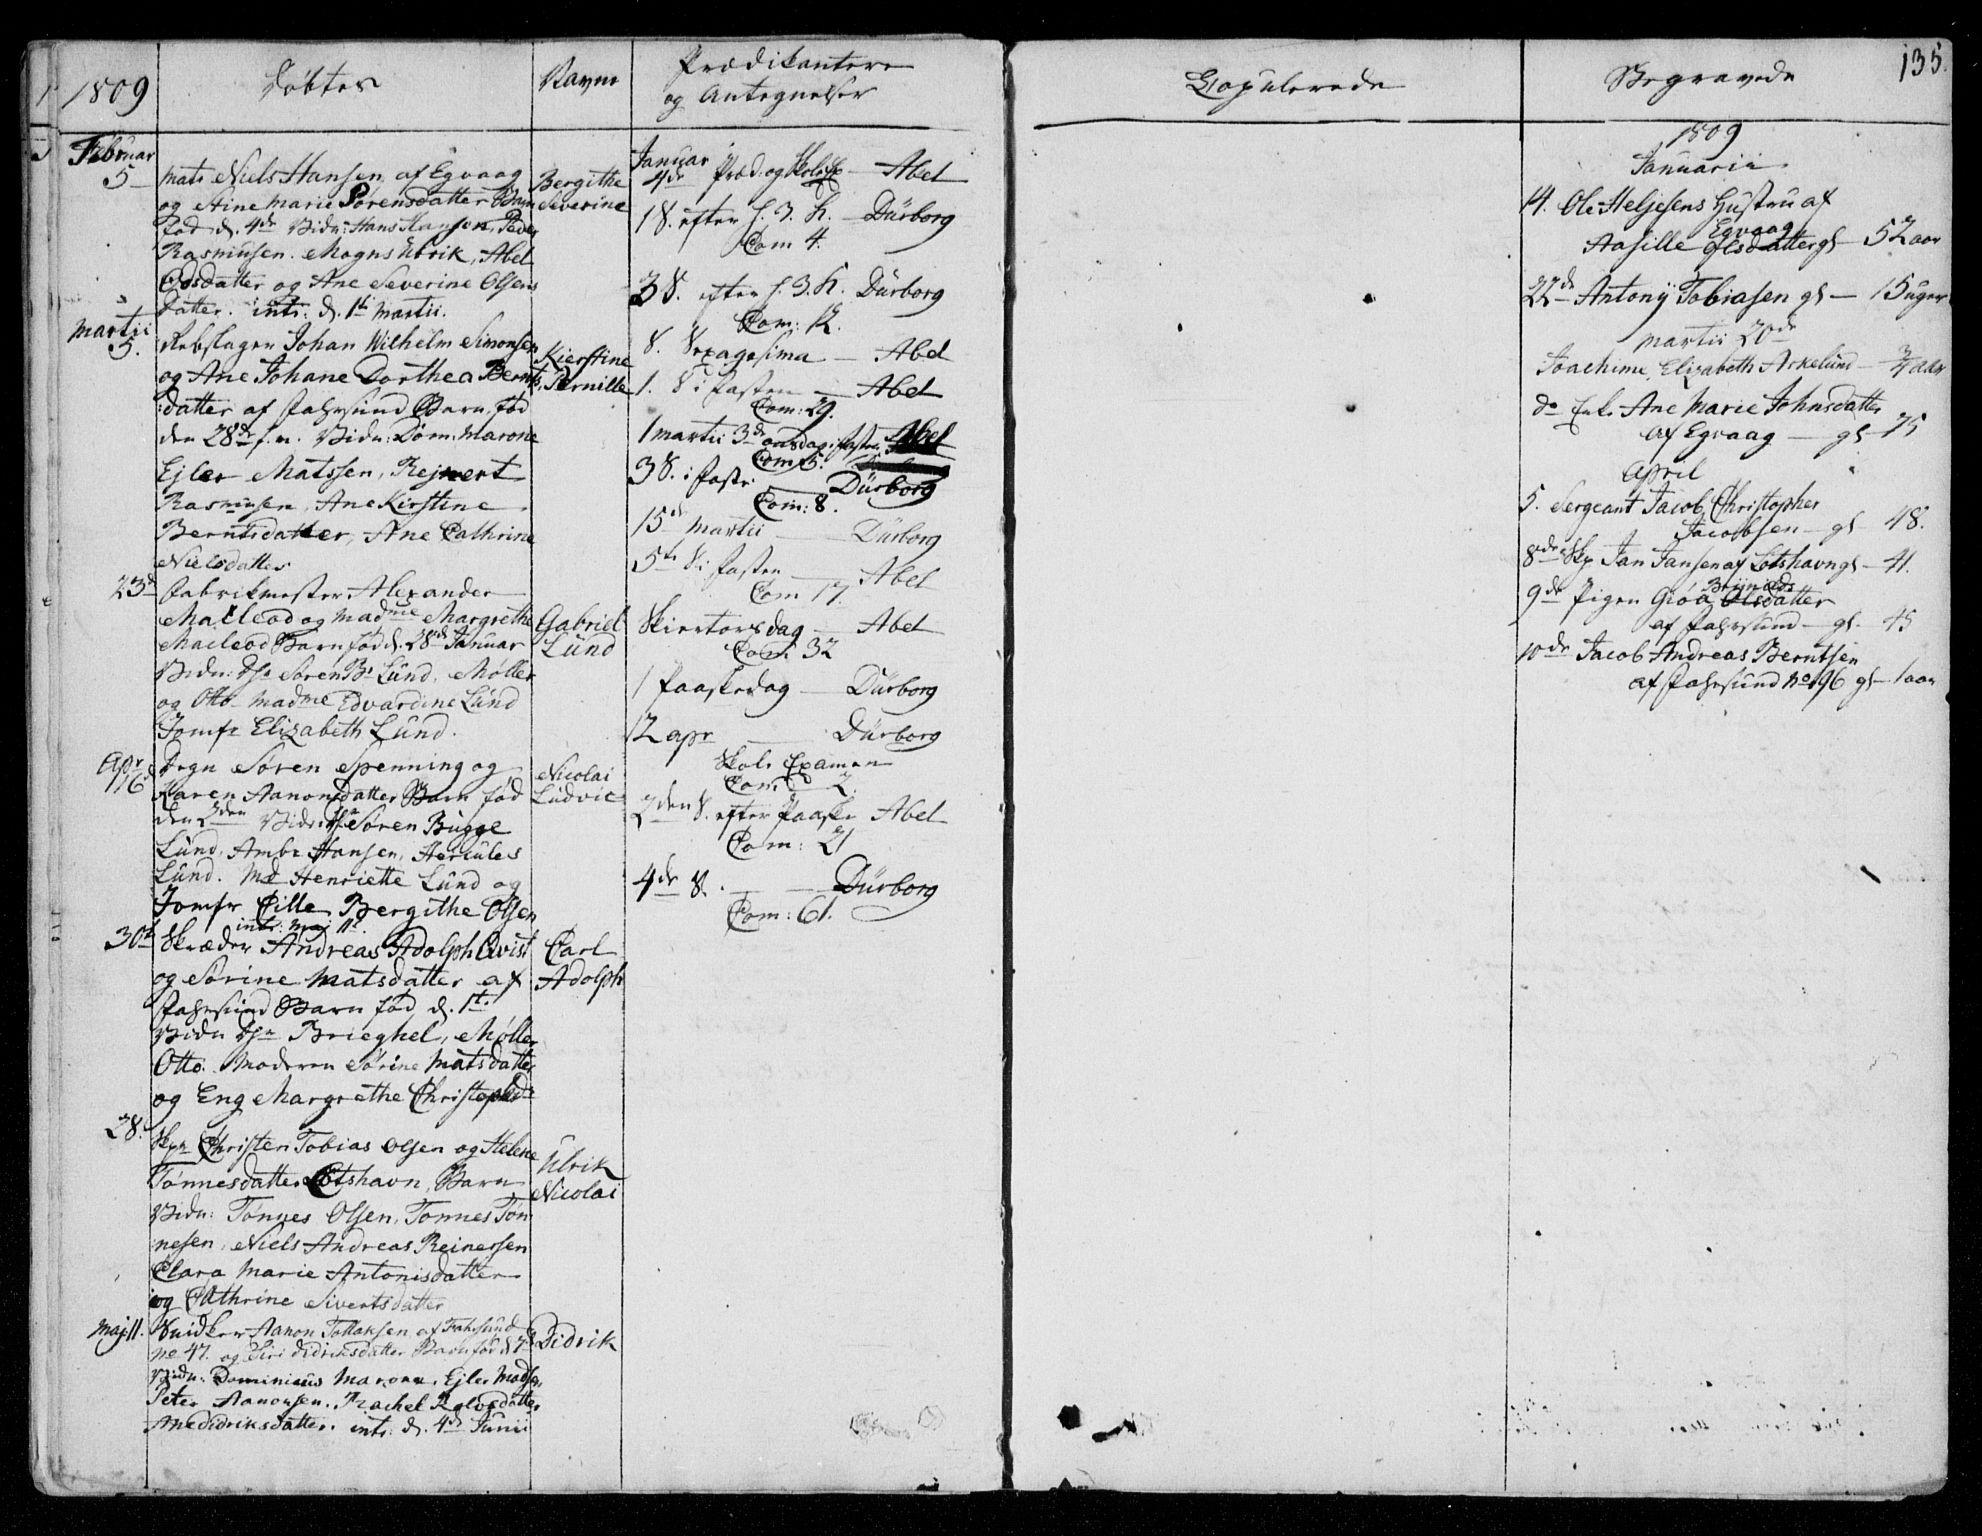 SAK, Farsund sokneprestkontor, F/Fa/L0001: Ministerialbok nr. A 1, 1784-1815, s. 135